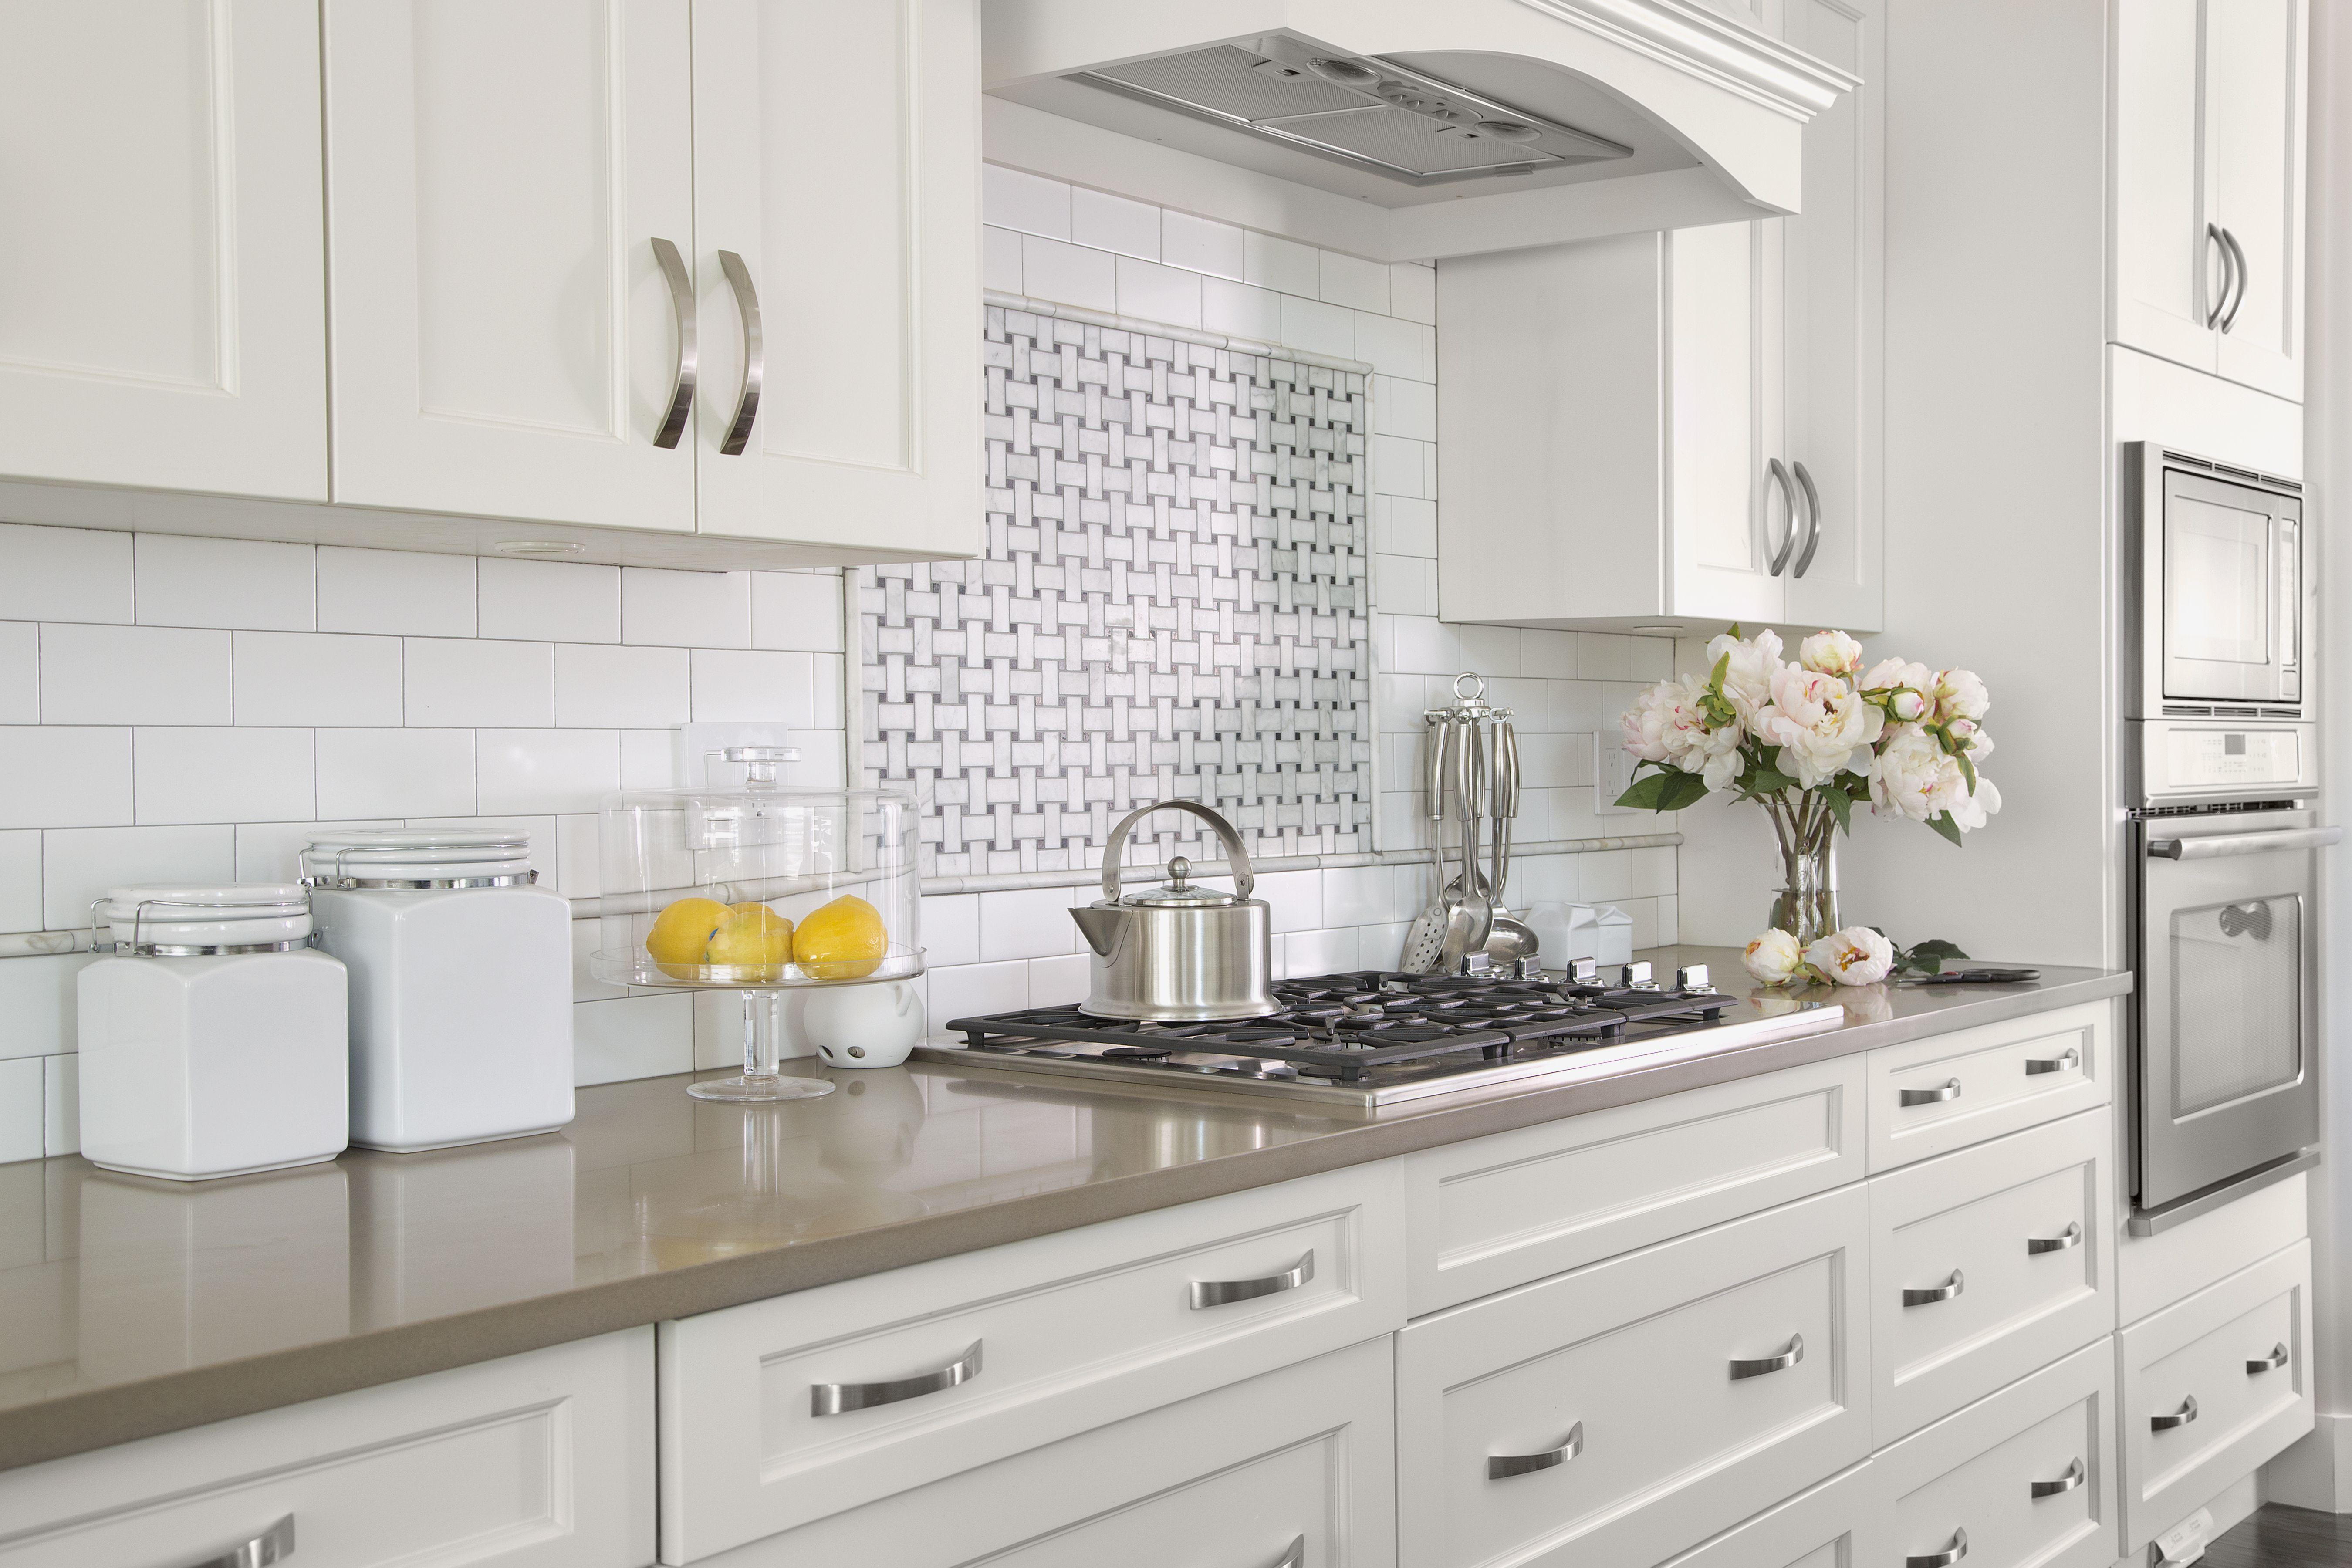 Thassos And Jet Black Dot Basketweave Kitchen Cabinet Styles Shaker Style Kitchen Cabinets Rta Kitchen Cabinets